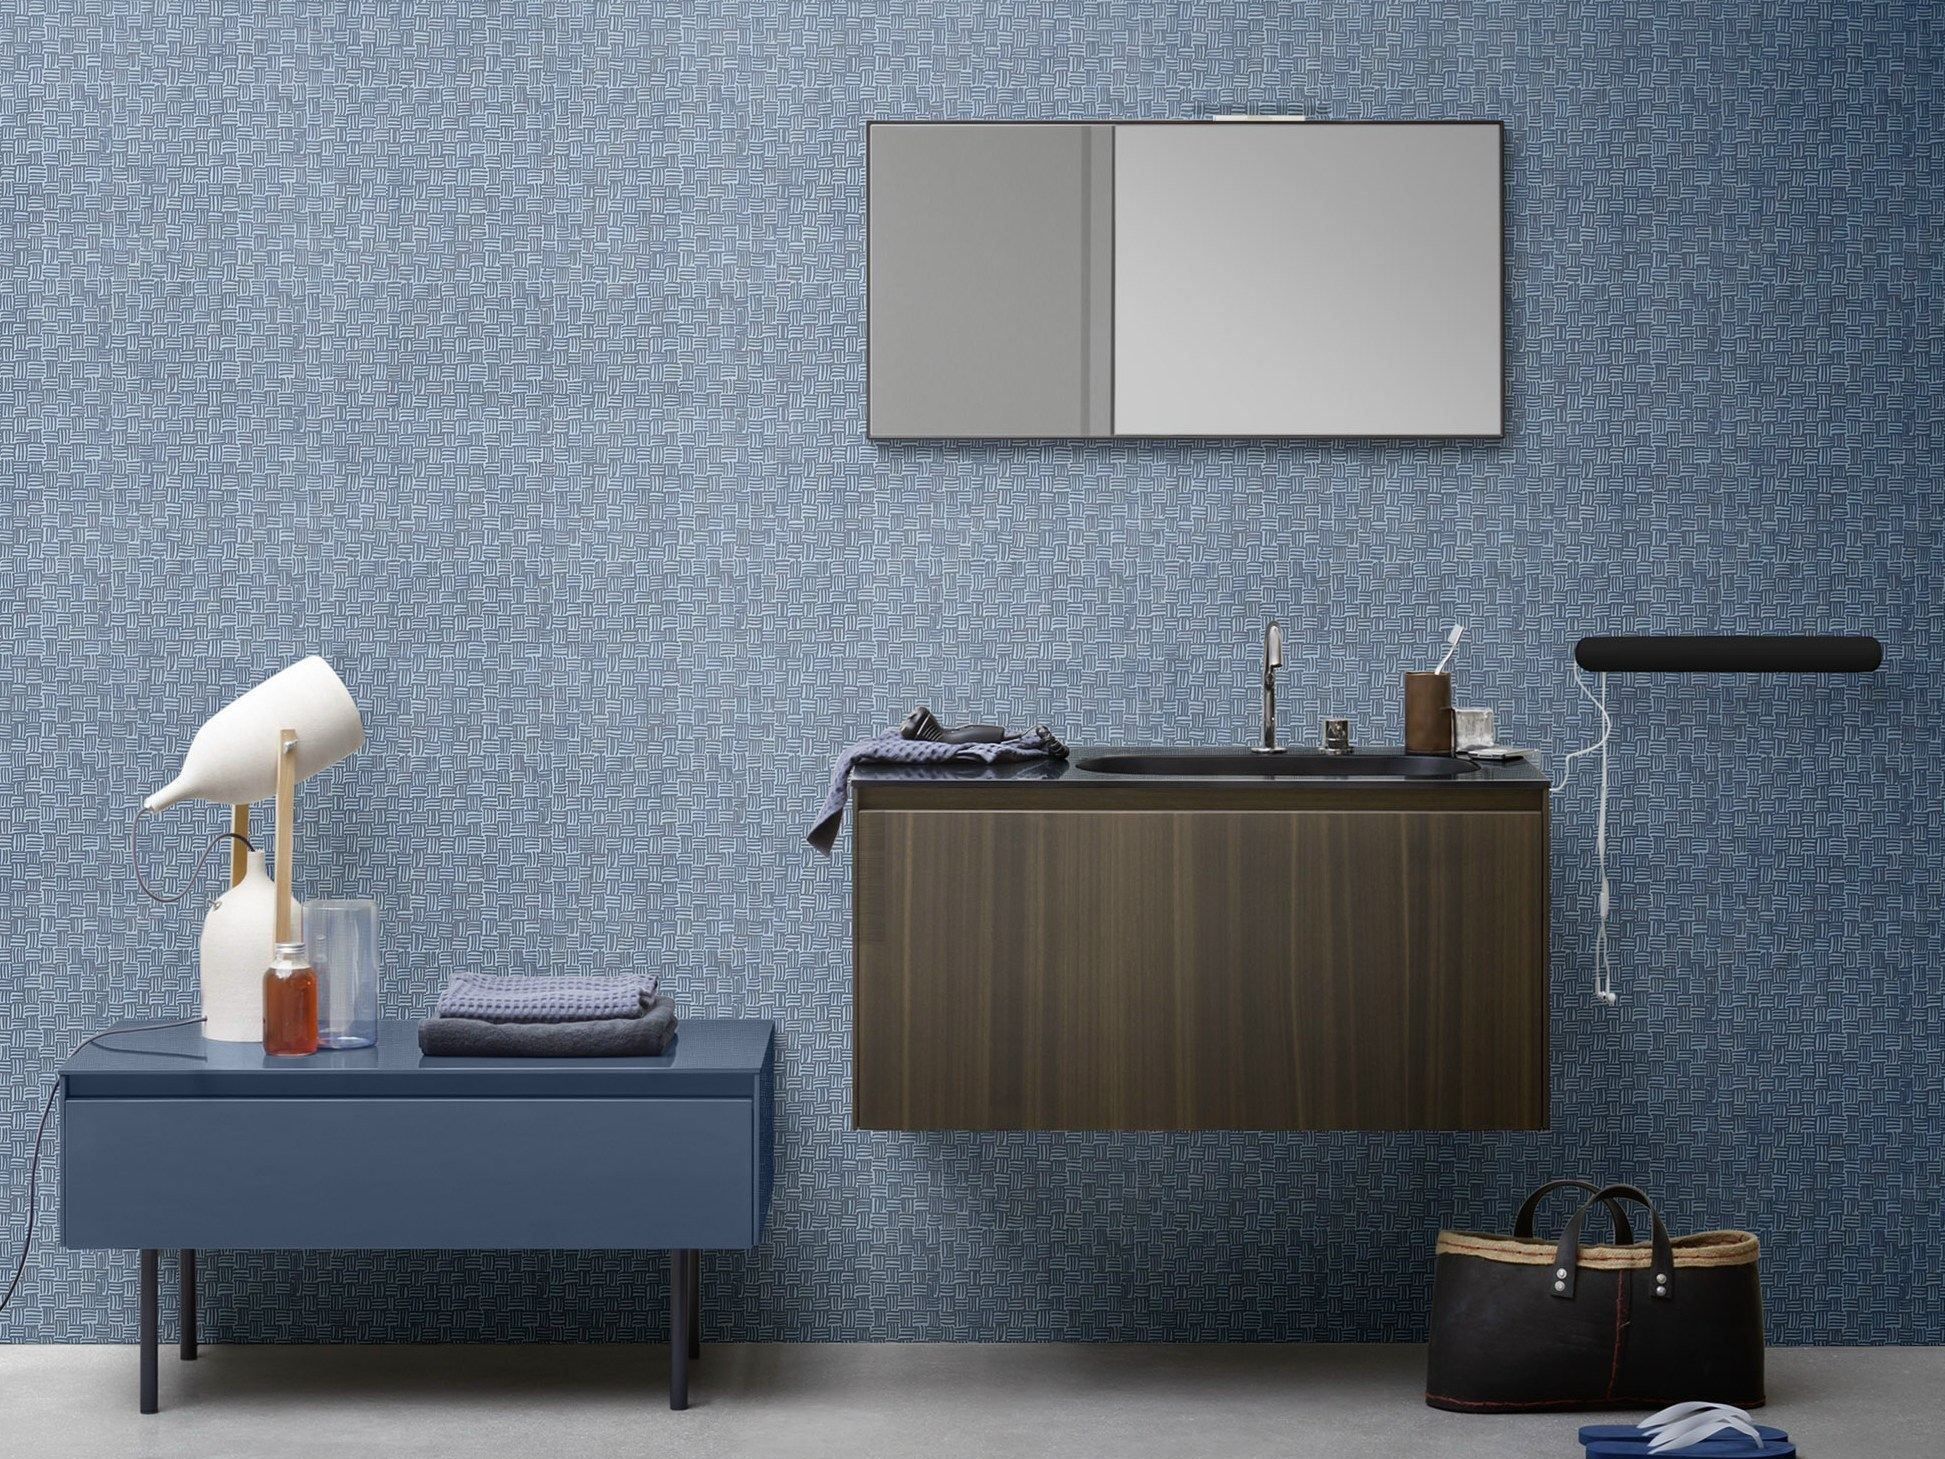 Rexa Design Elegant Console Semiinset Korakril Washbasin Giano  # Muebles Di Giano